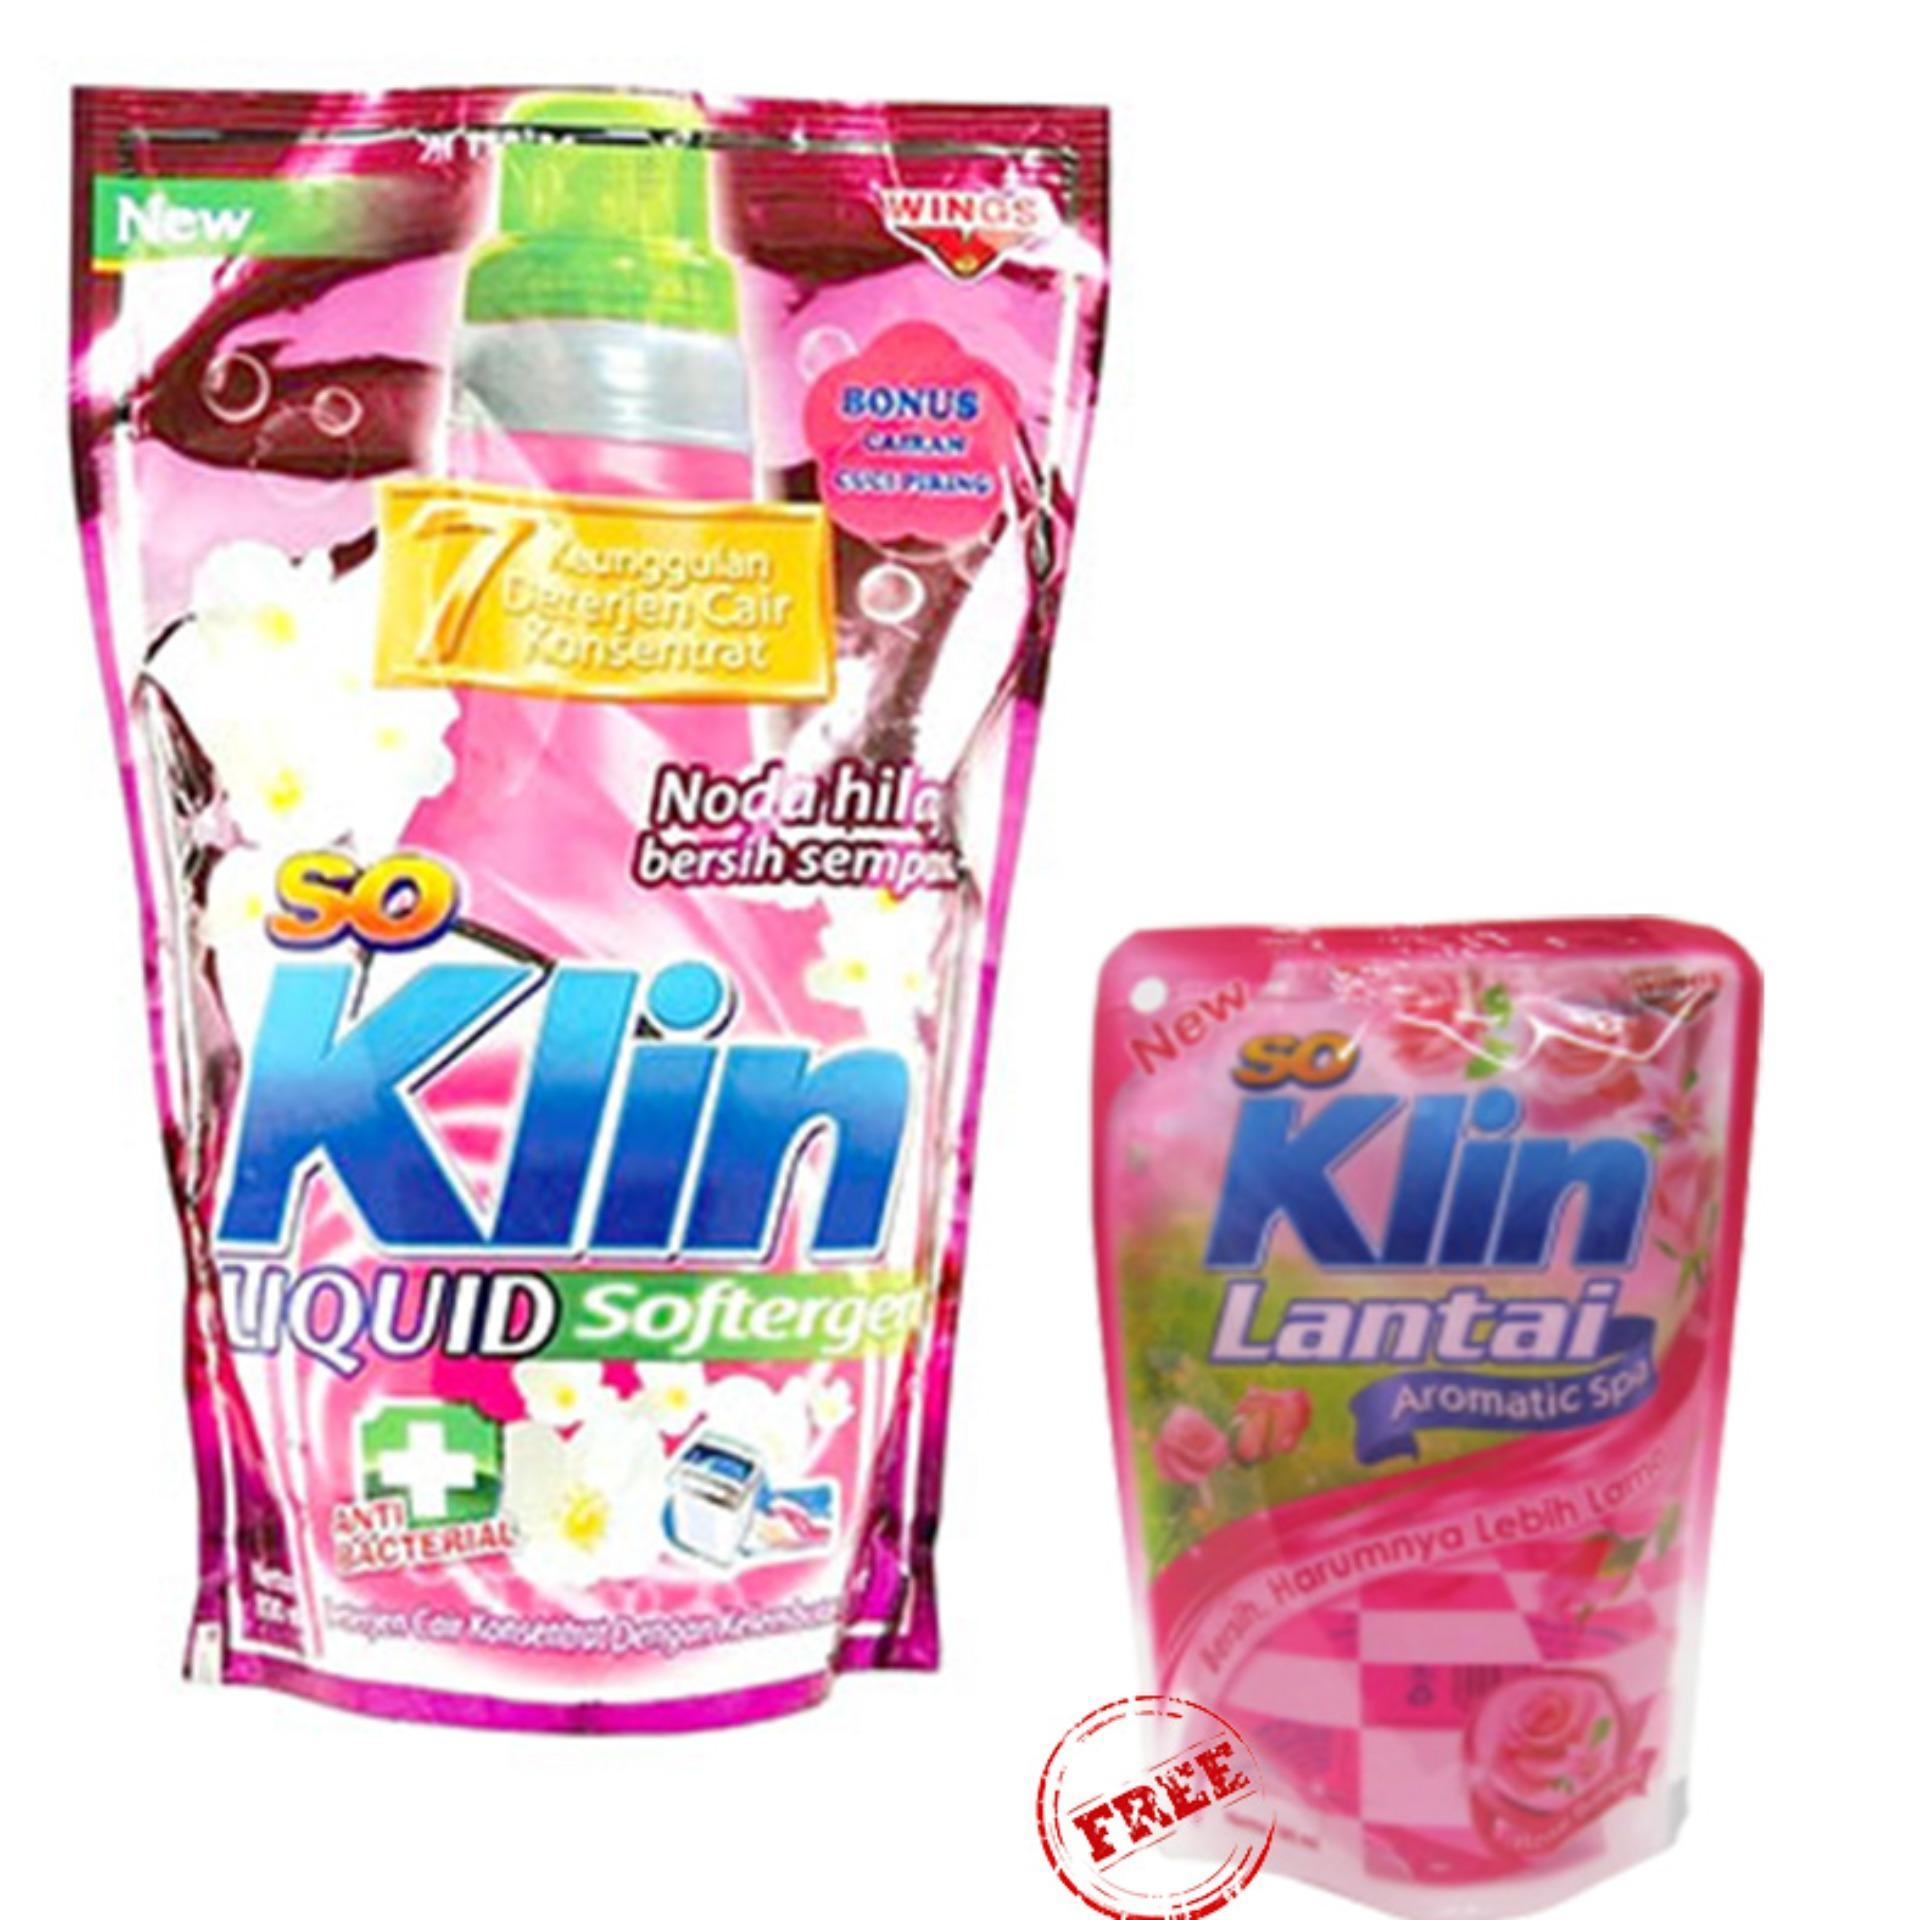 Kelebihan Klin Pak Cling Wrap Refil Terkini Daftar Harga Dan Bagus Refill 30 Cm X M Polyethylene Non Pvc So Liquid Detergen Gratis Lantai